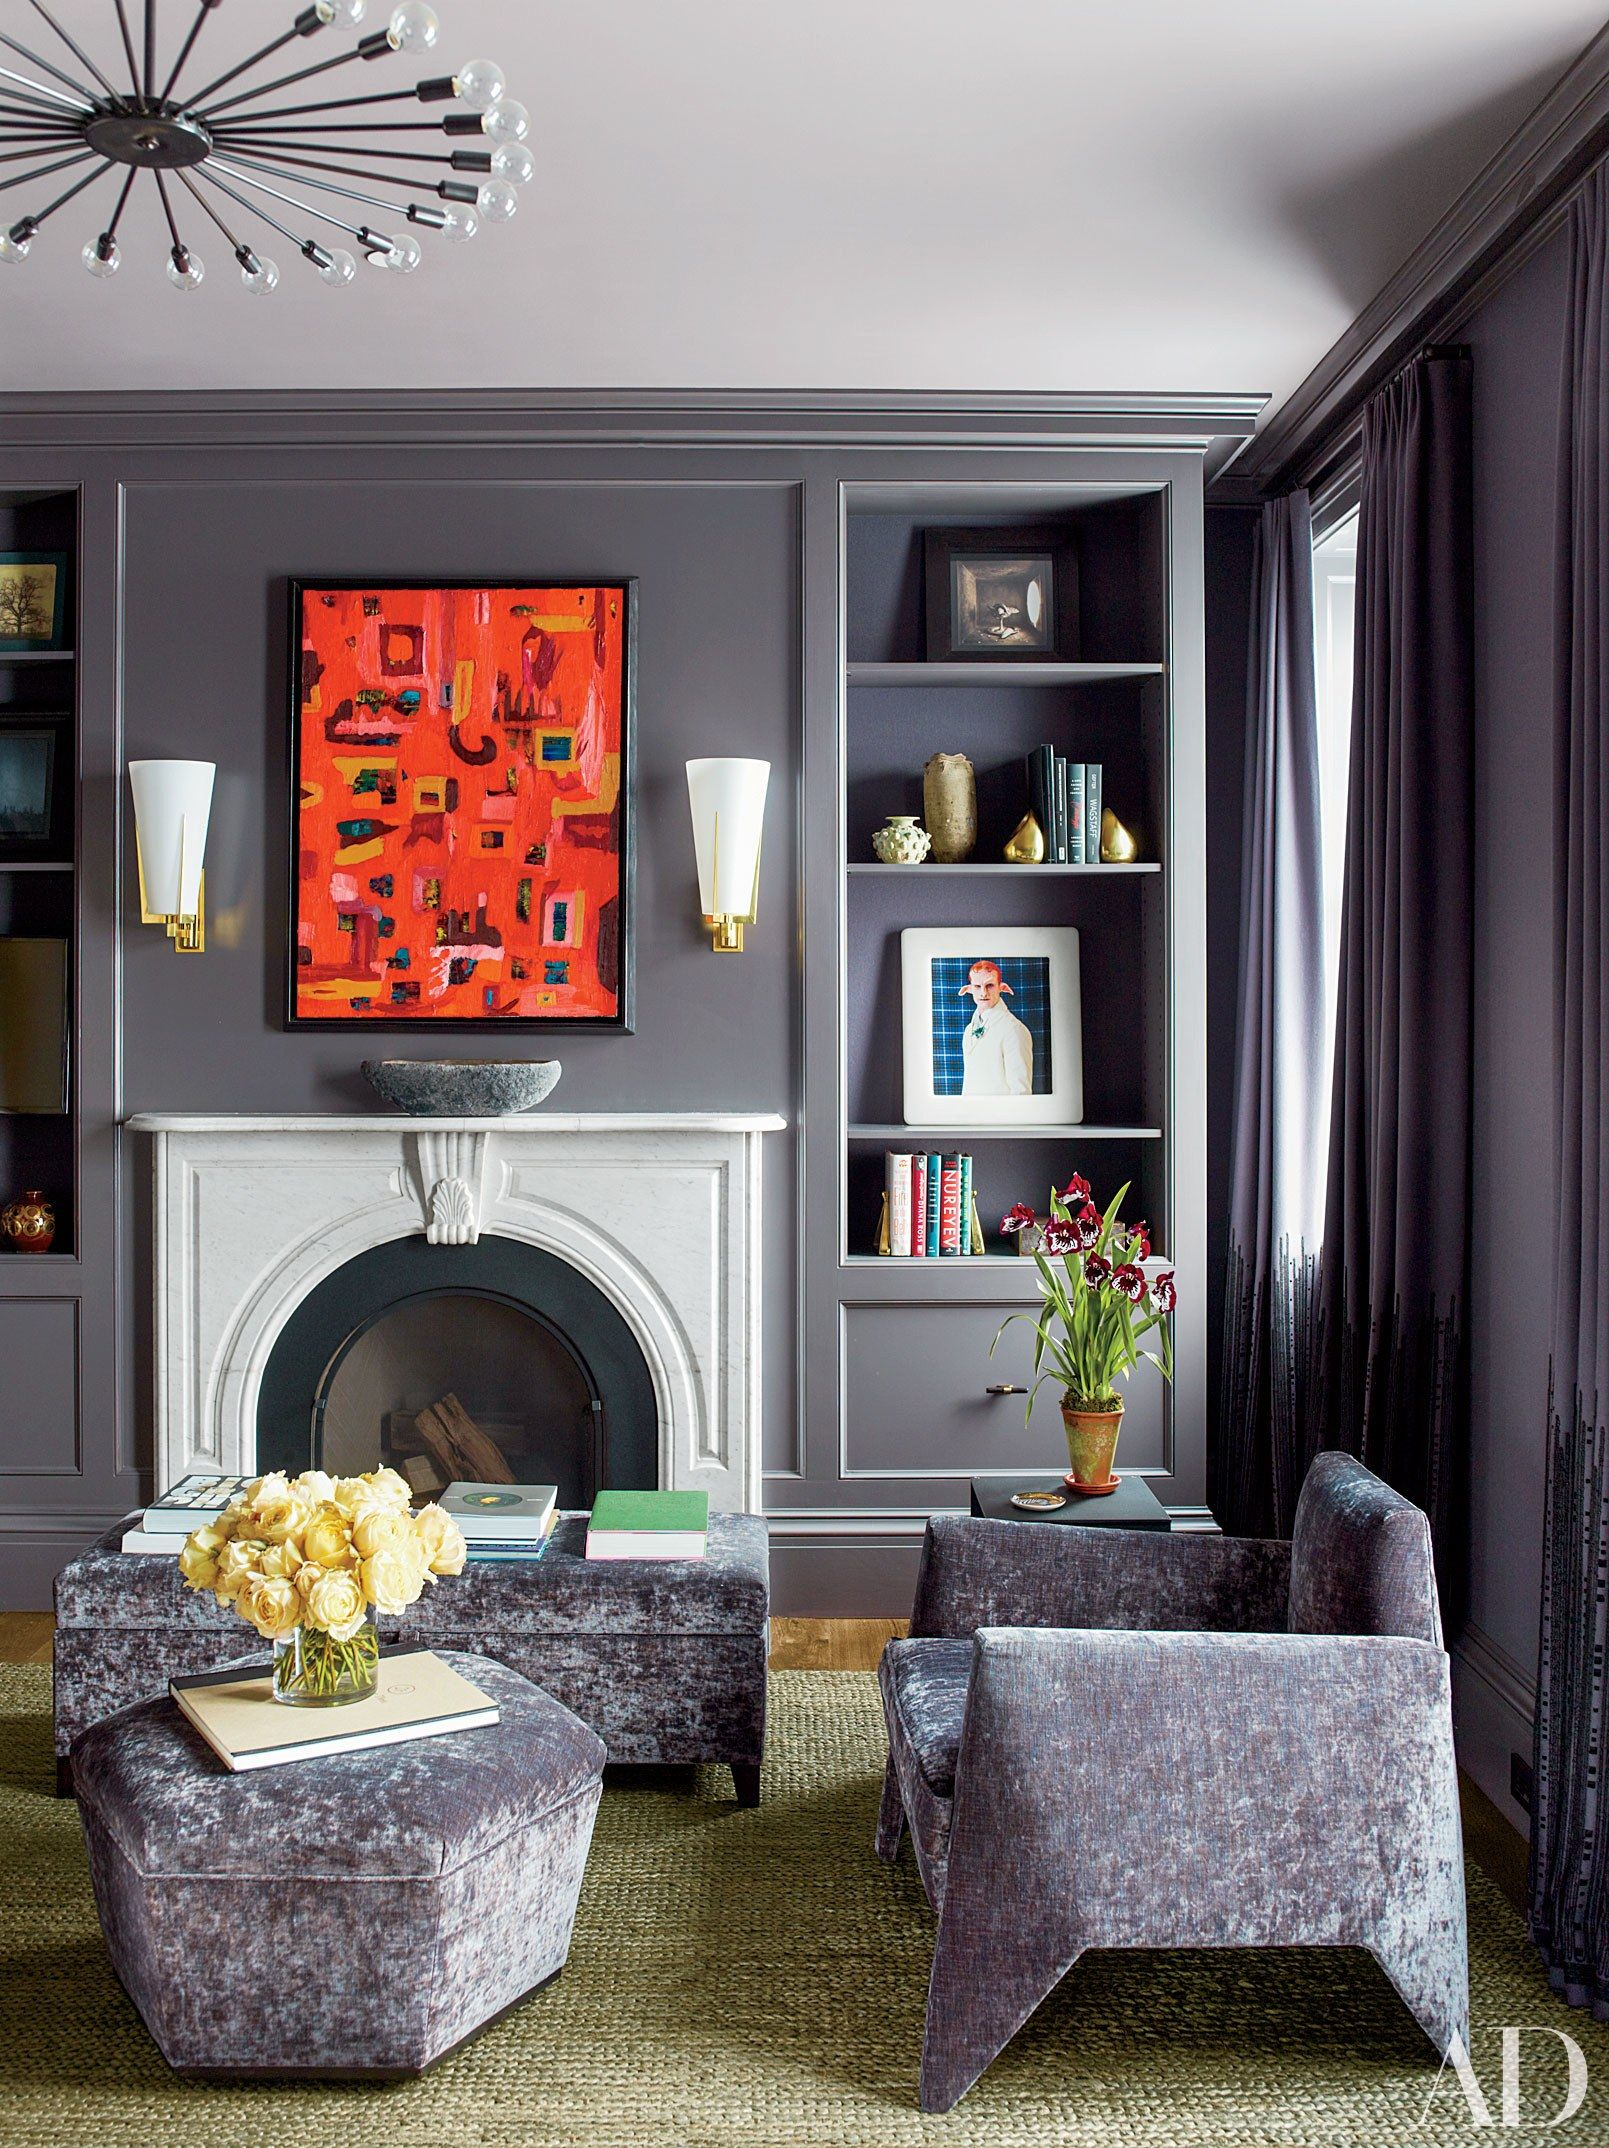 6 contemporary rooms by shawn henderson interior design photos architectural digest design per interno contemporaneo